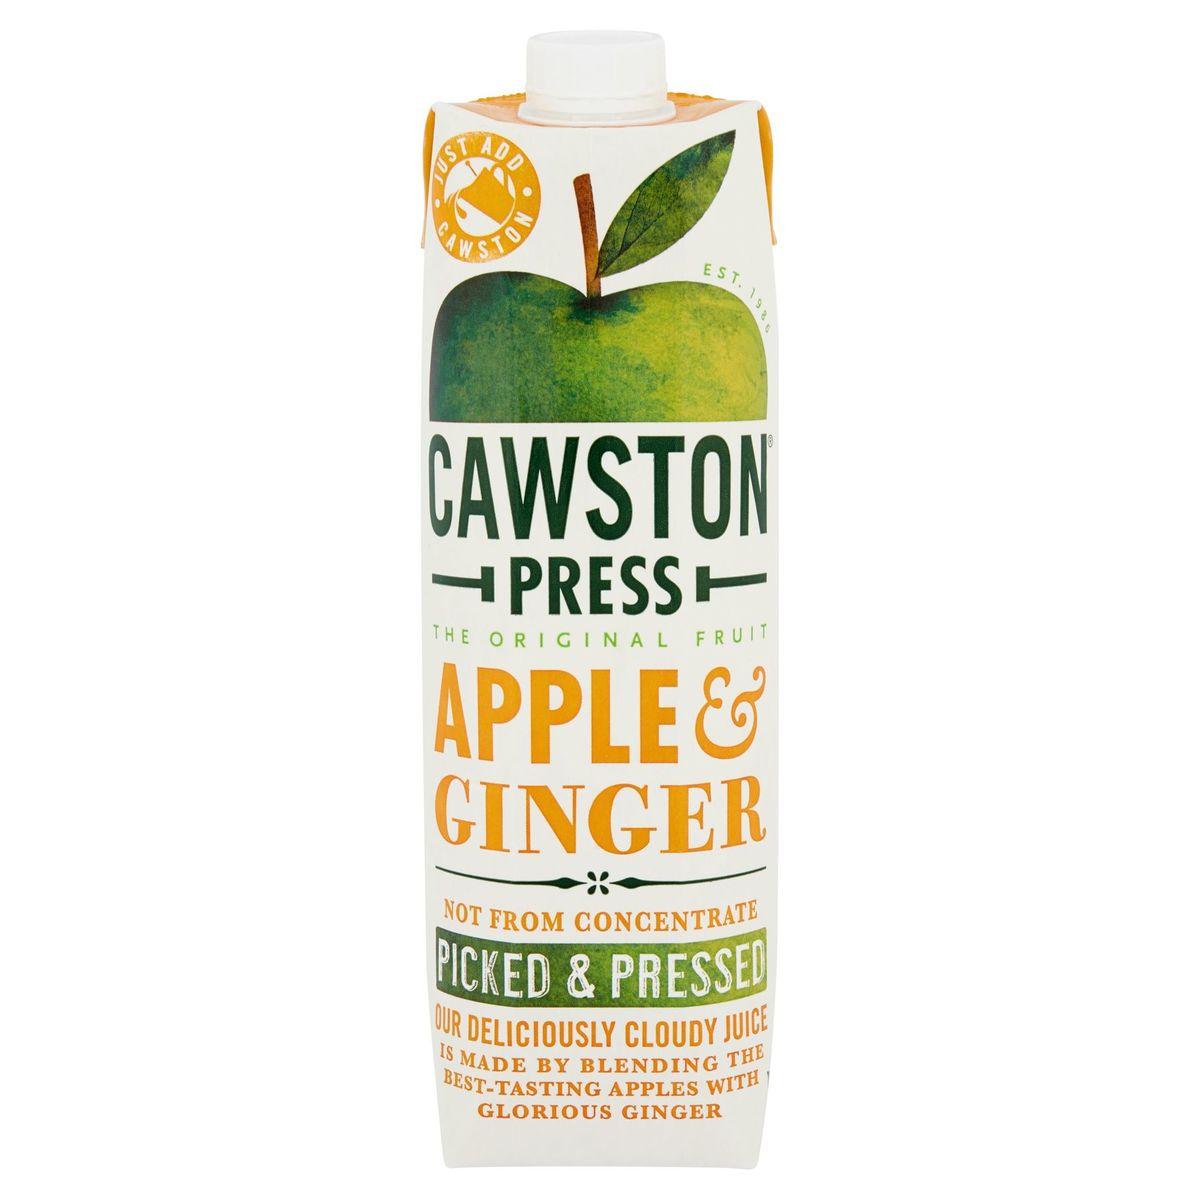 Cawston Press The Original Fruit Apple & Ginger 1 L